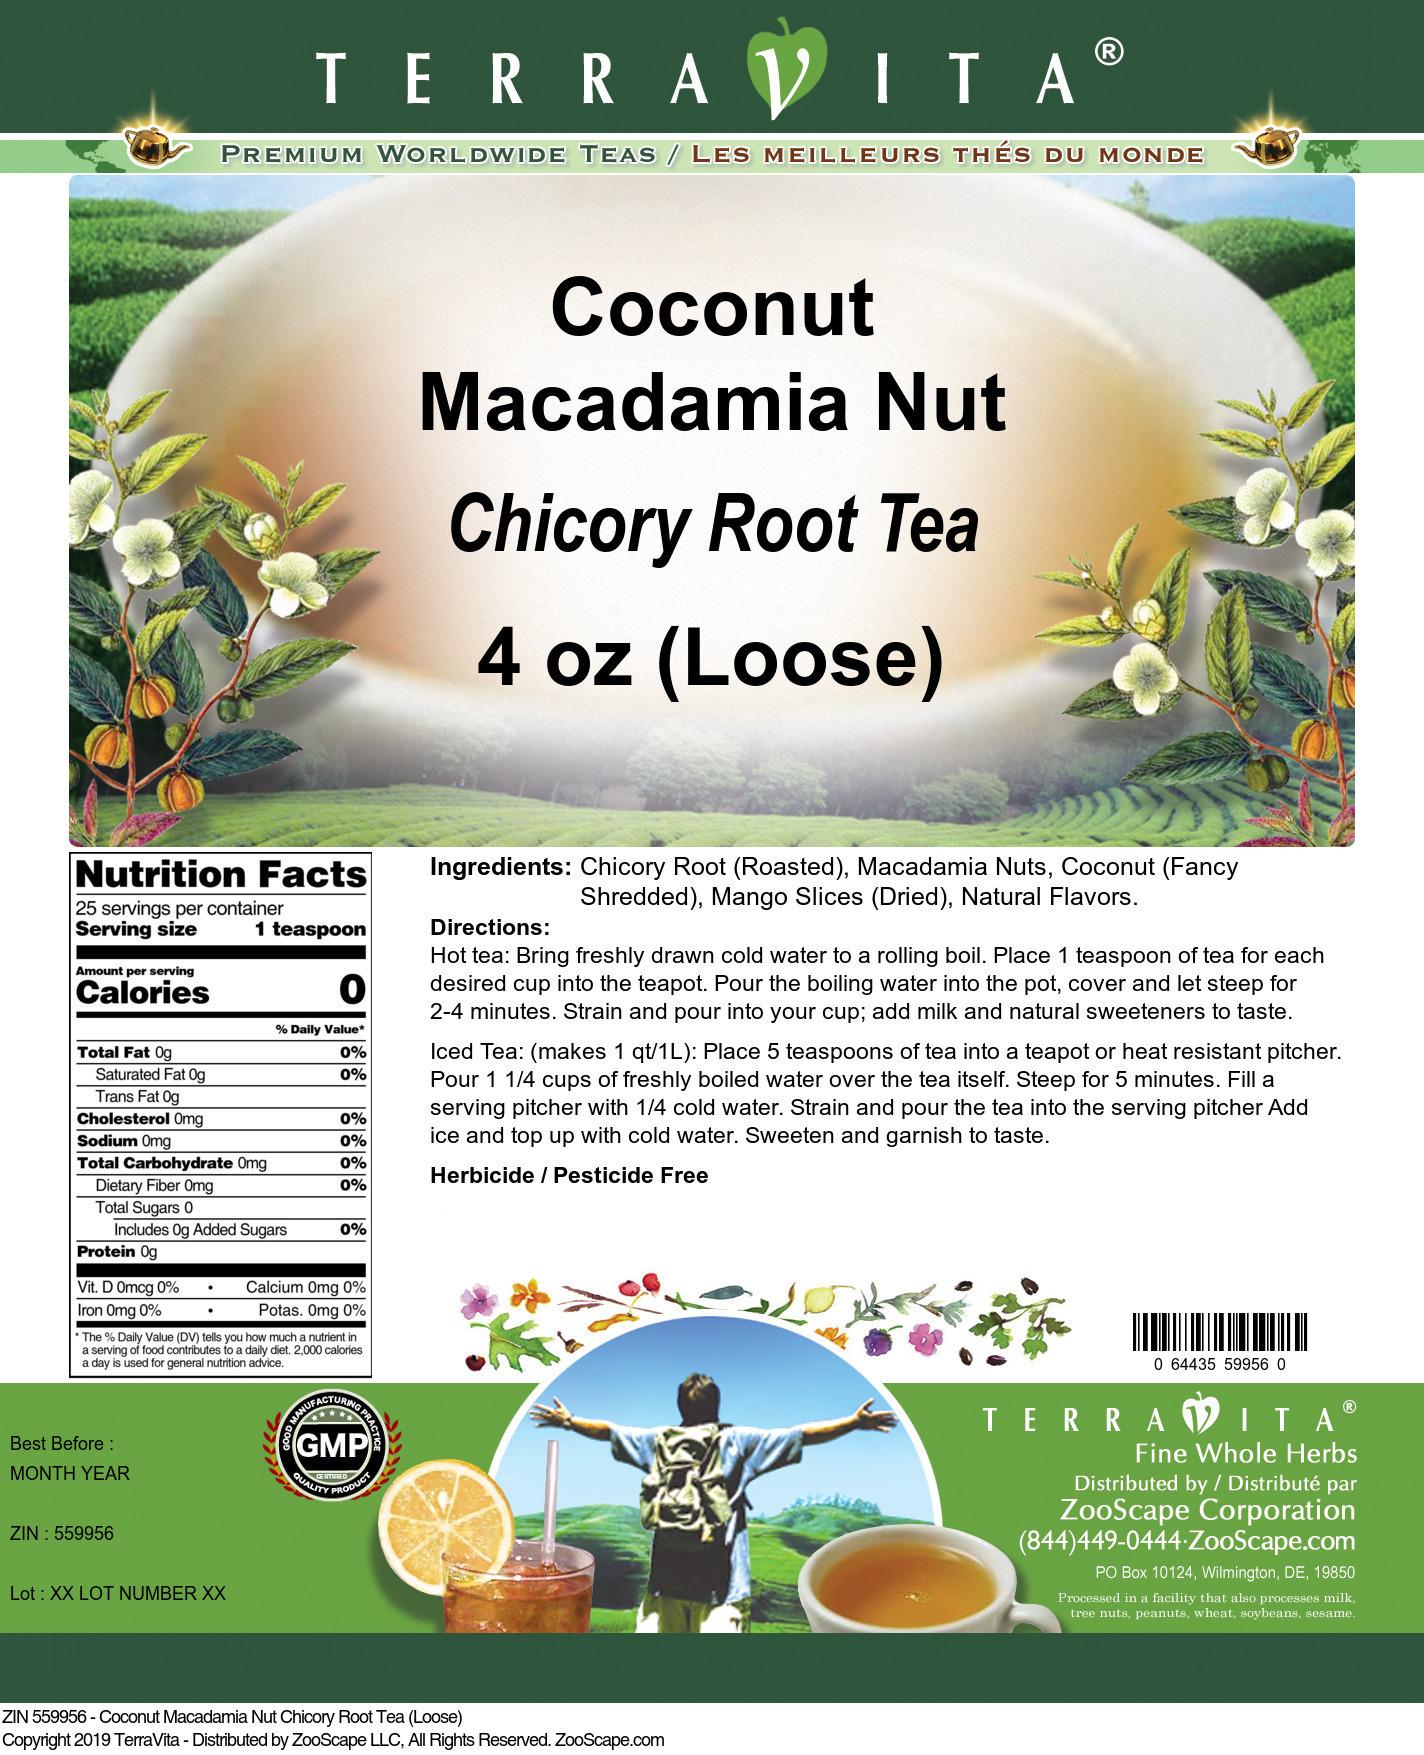 Coconut Macadamia Nut Chicory Root